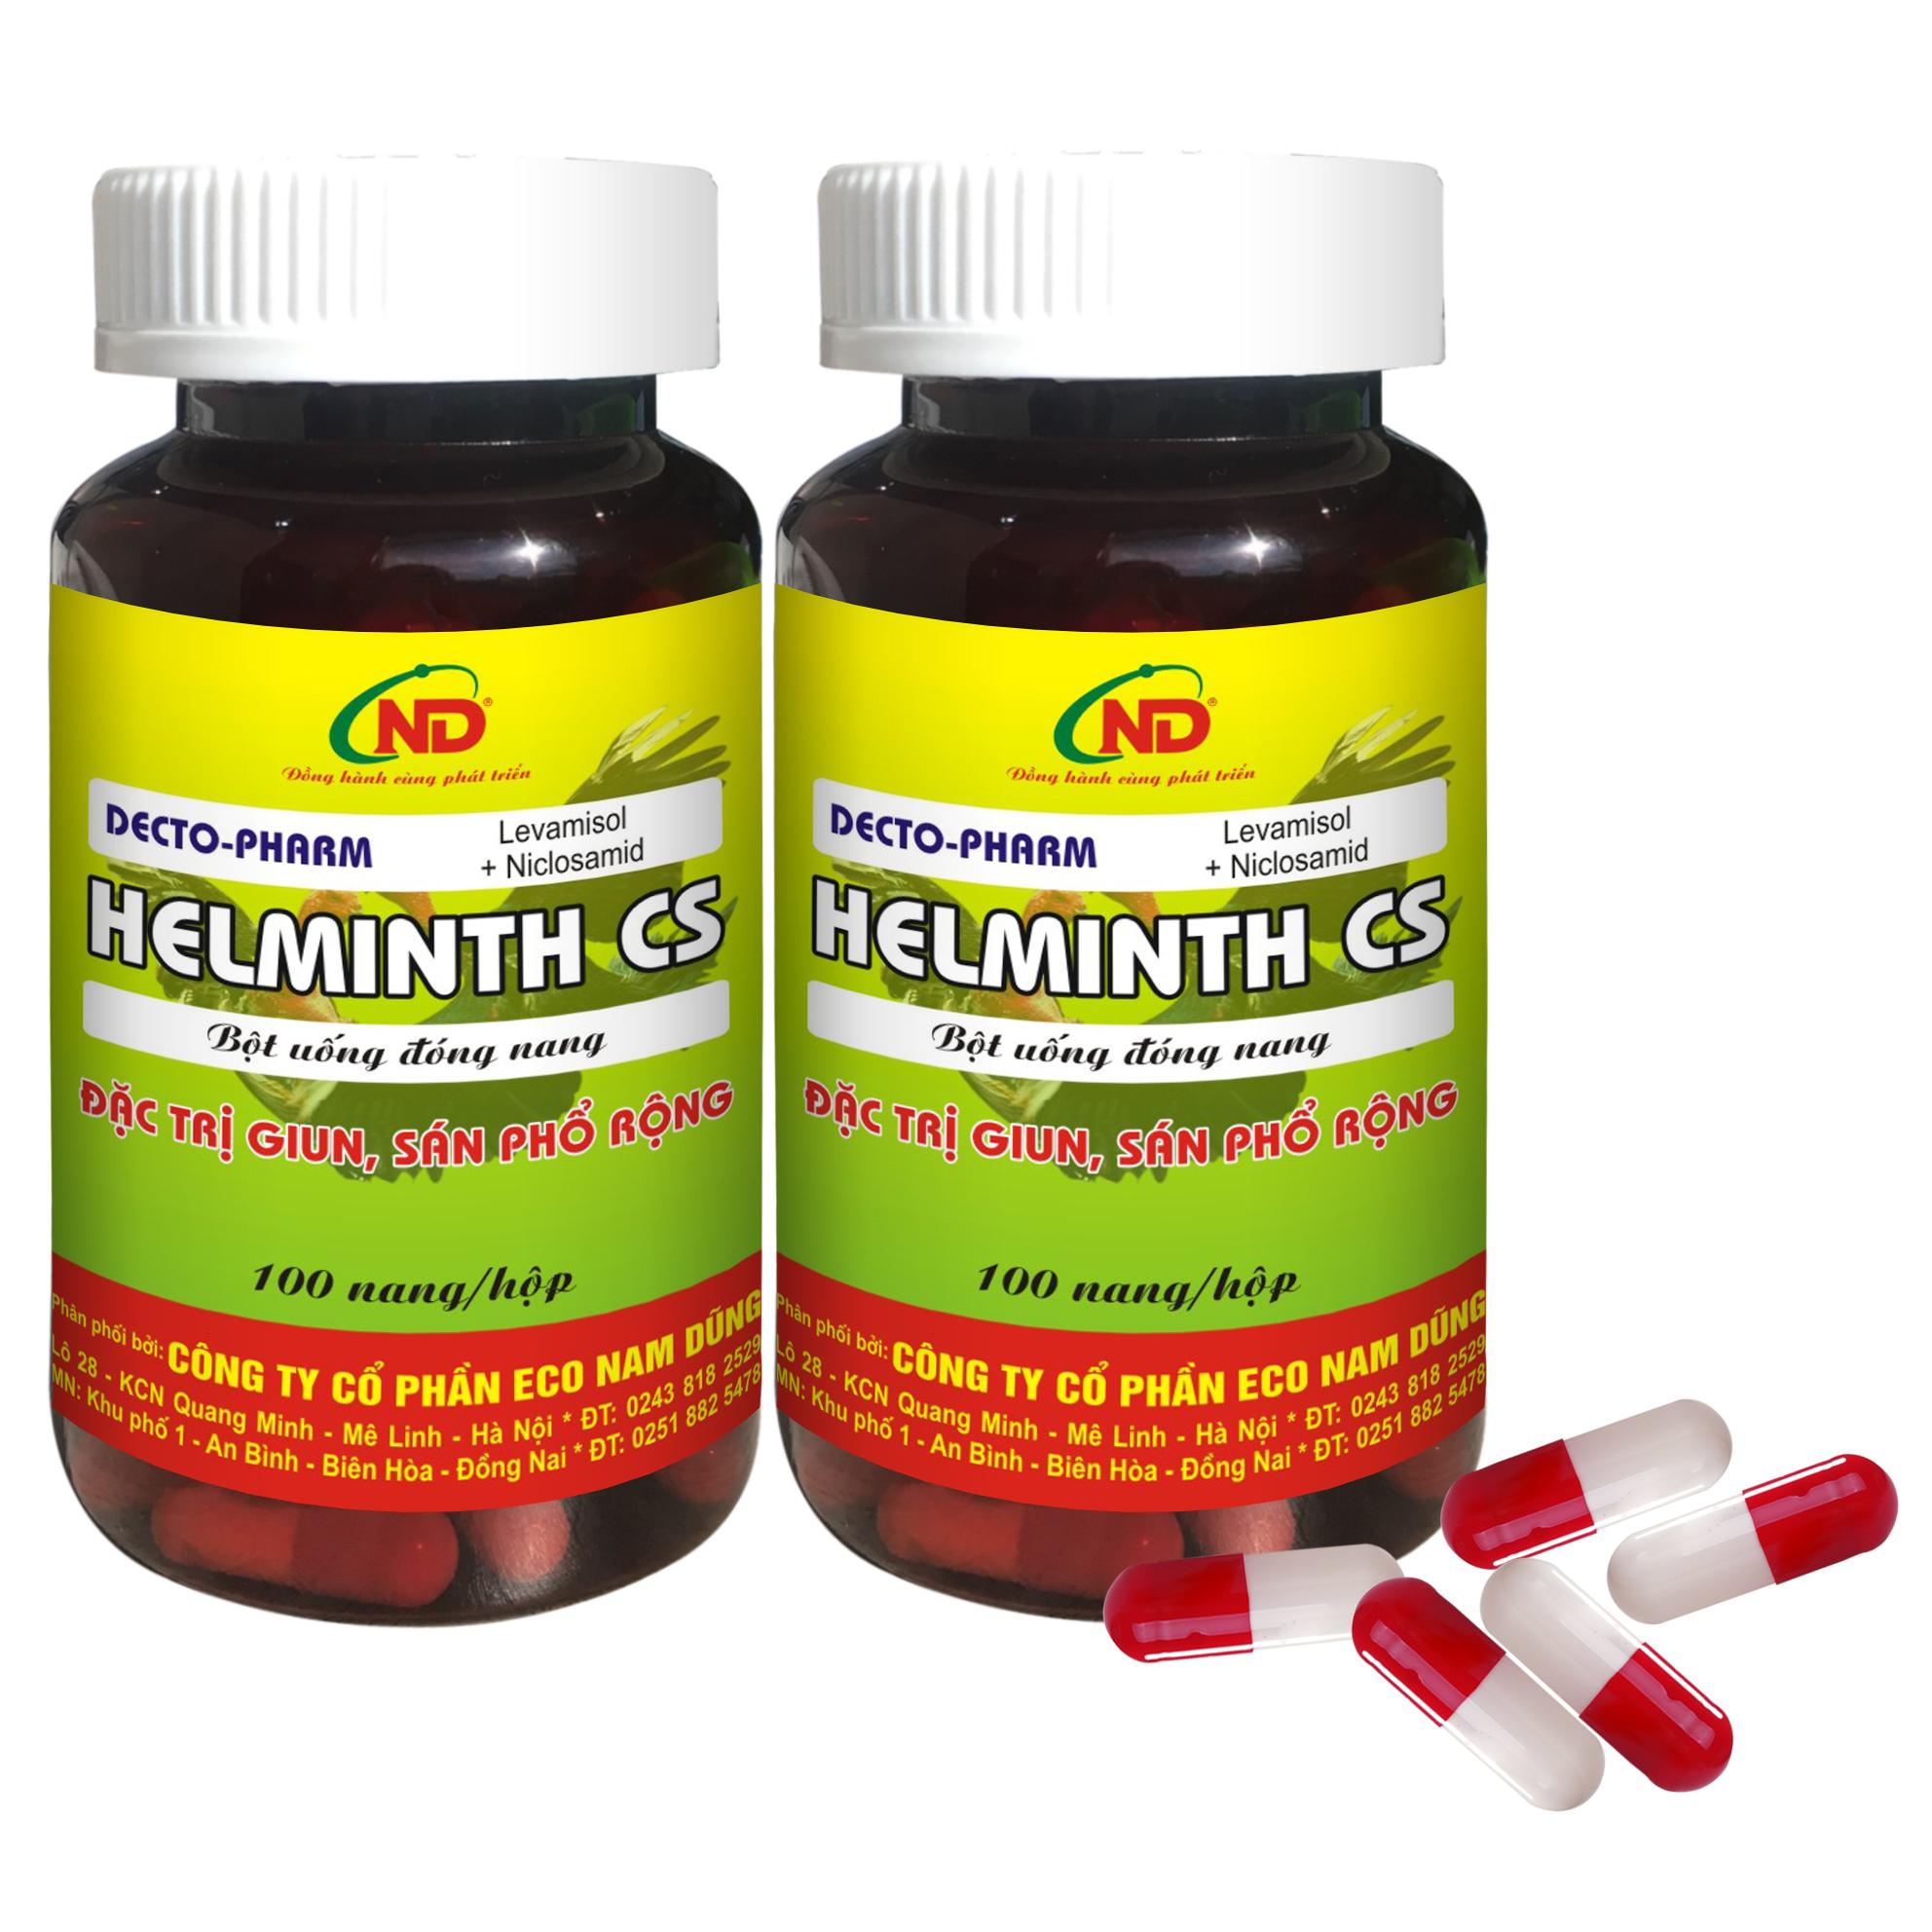 Helminth CS